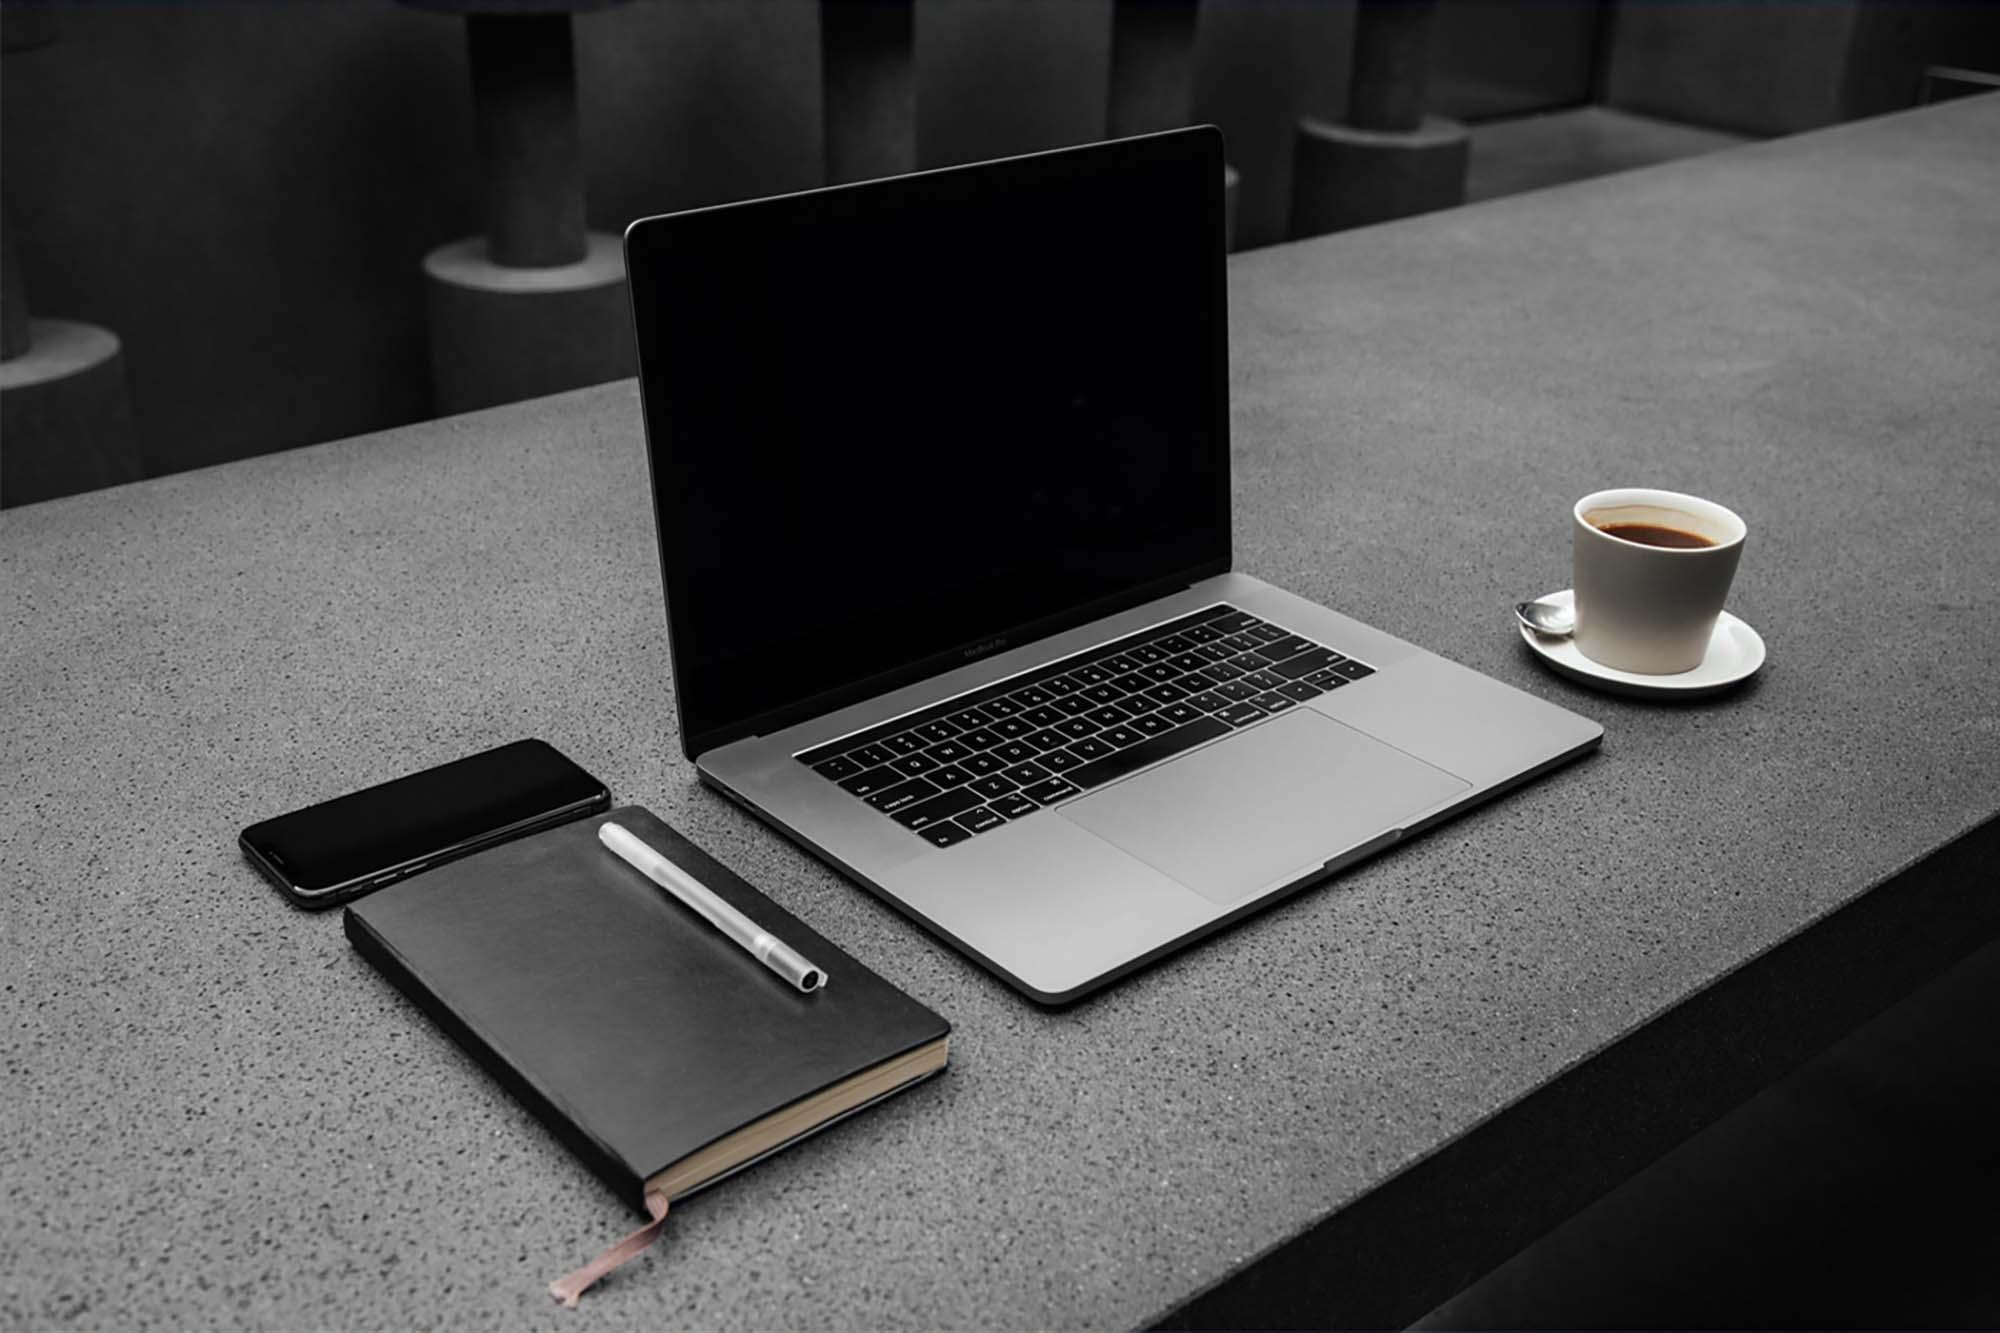 MacBook Pro Workspace Mockup 2